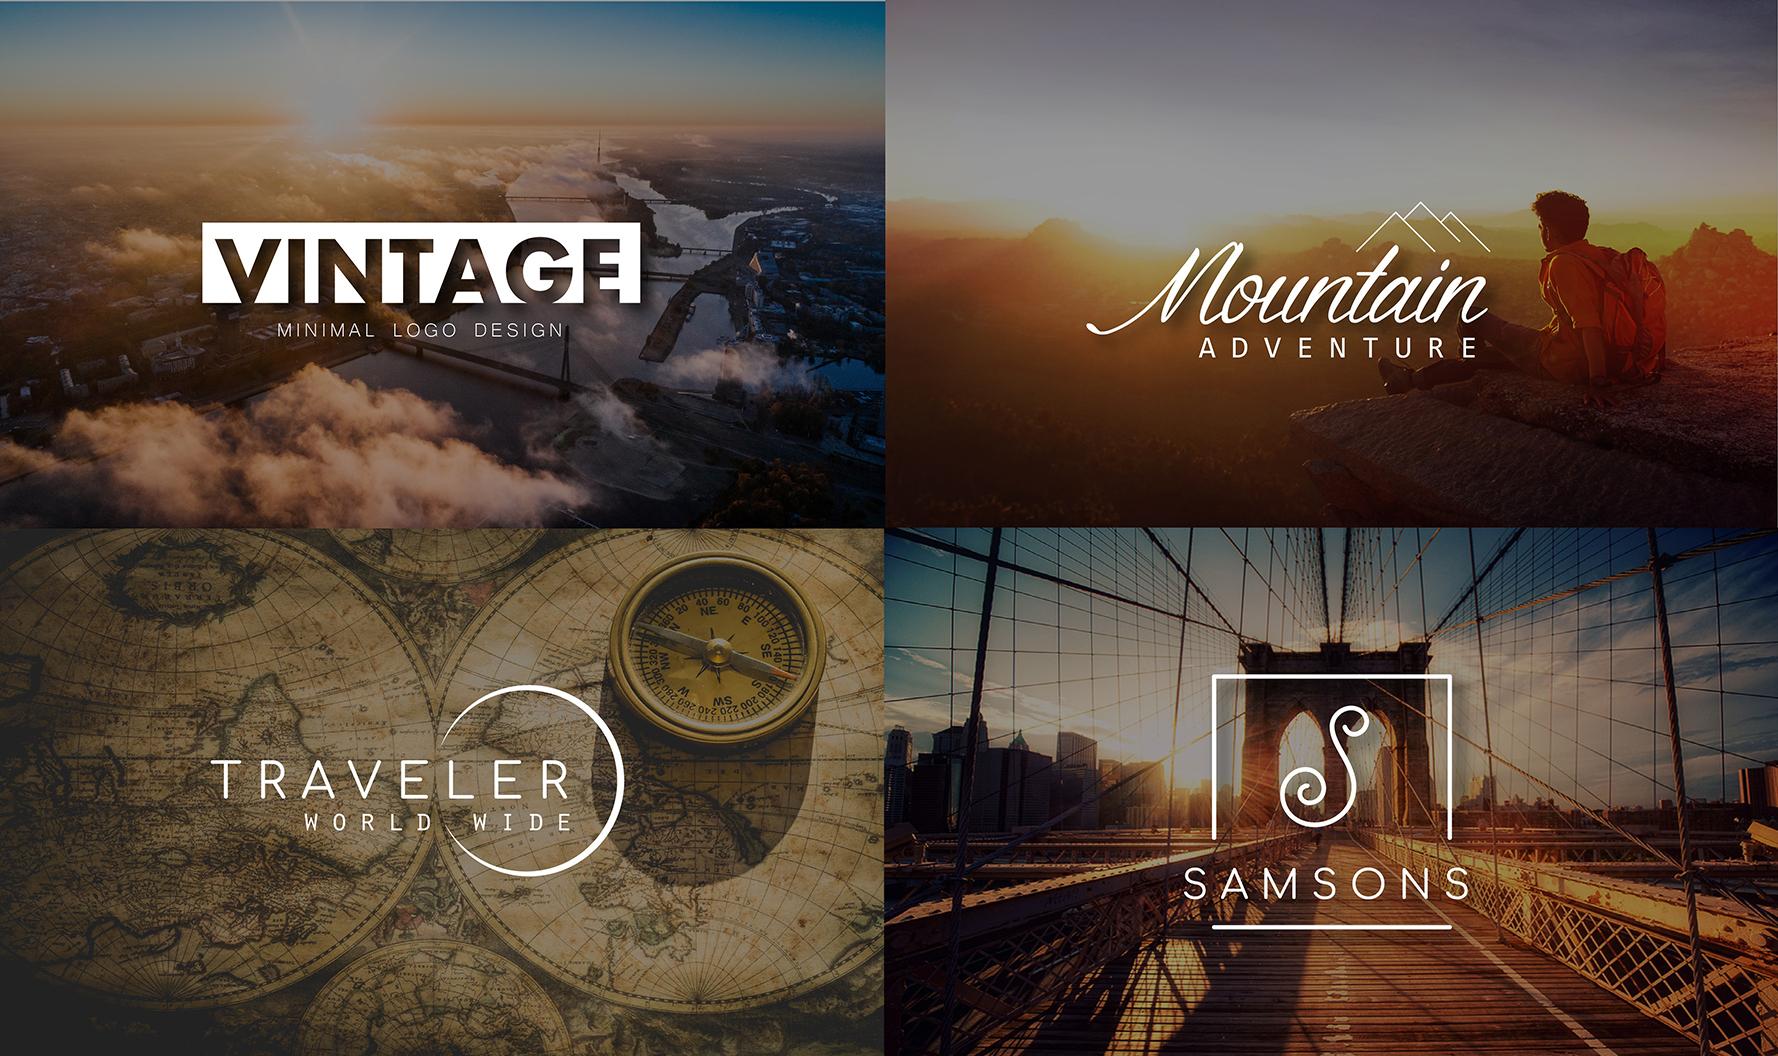 Design Minimal Vintage business logos